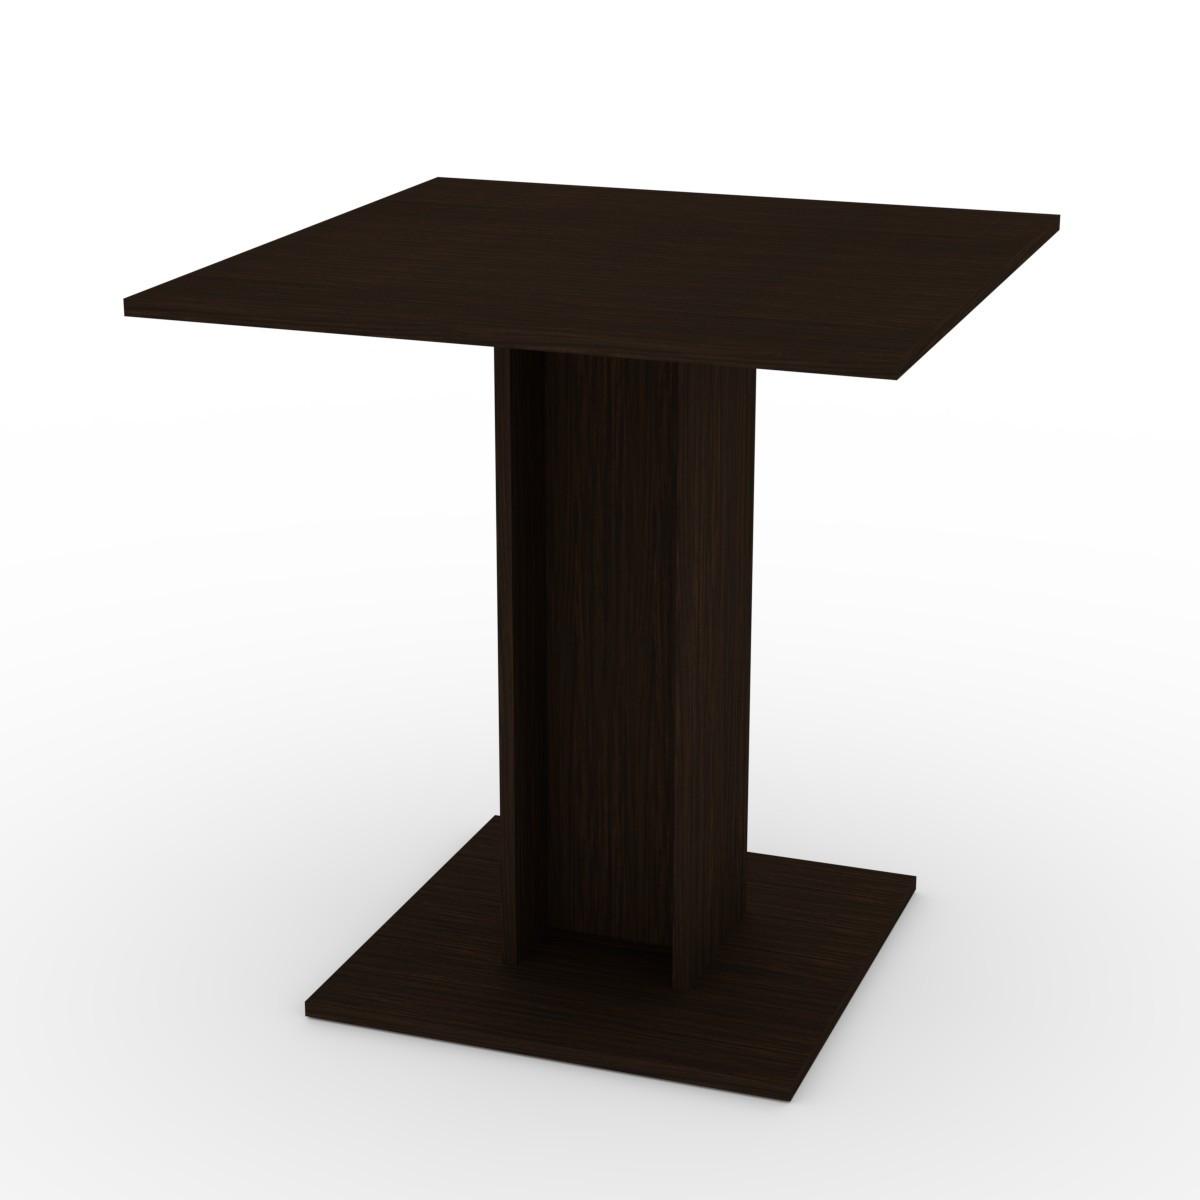 Стол кухонный КС-7 венге темный Компанит (70х70х74 см)